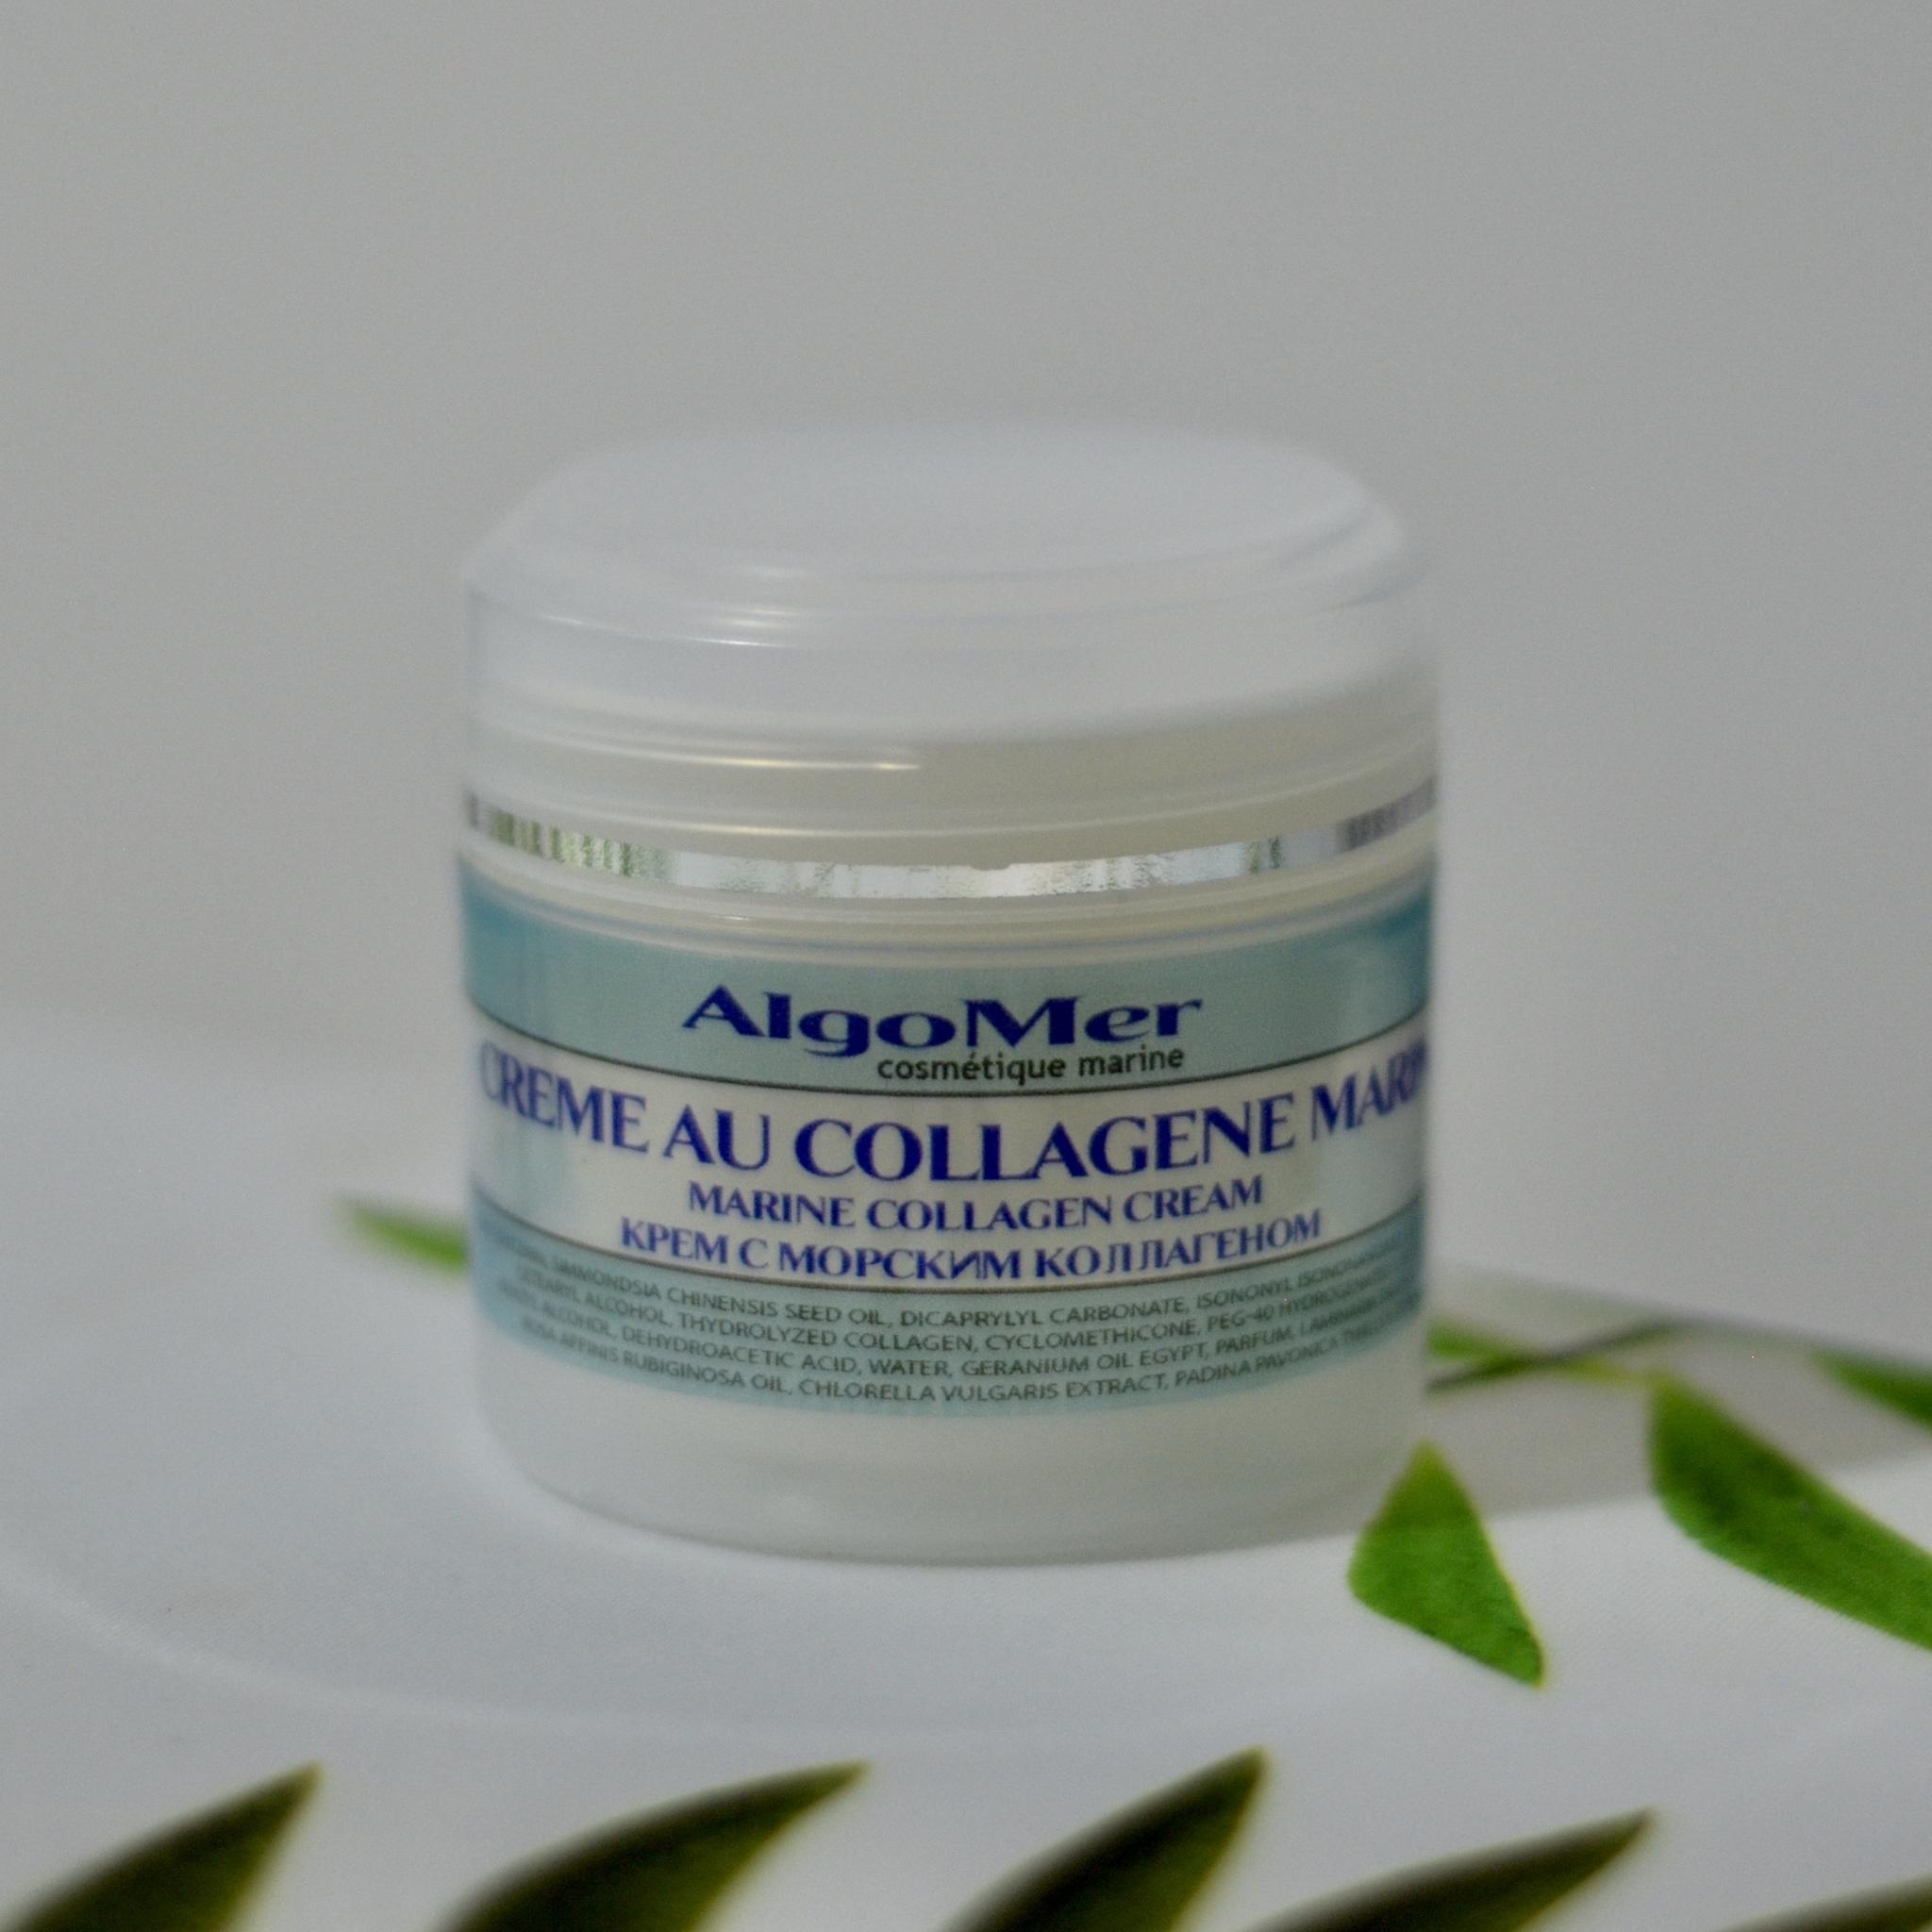 Algomer Crème Au Collagen Marin